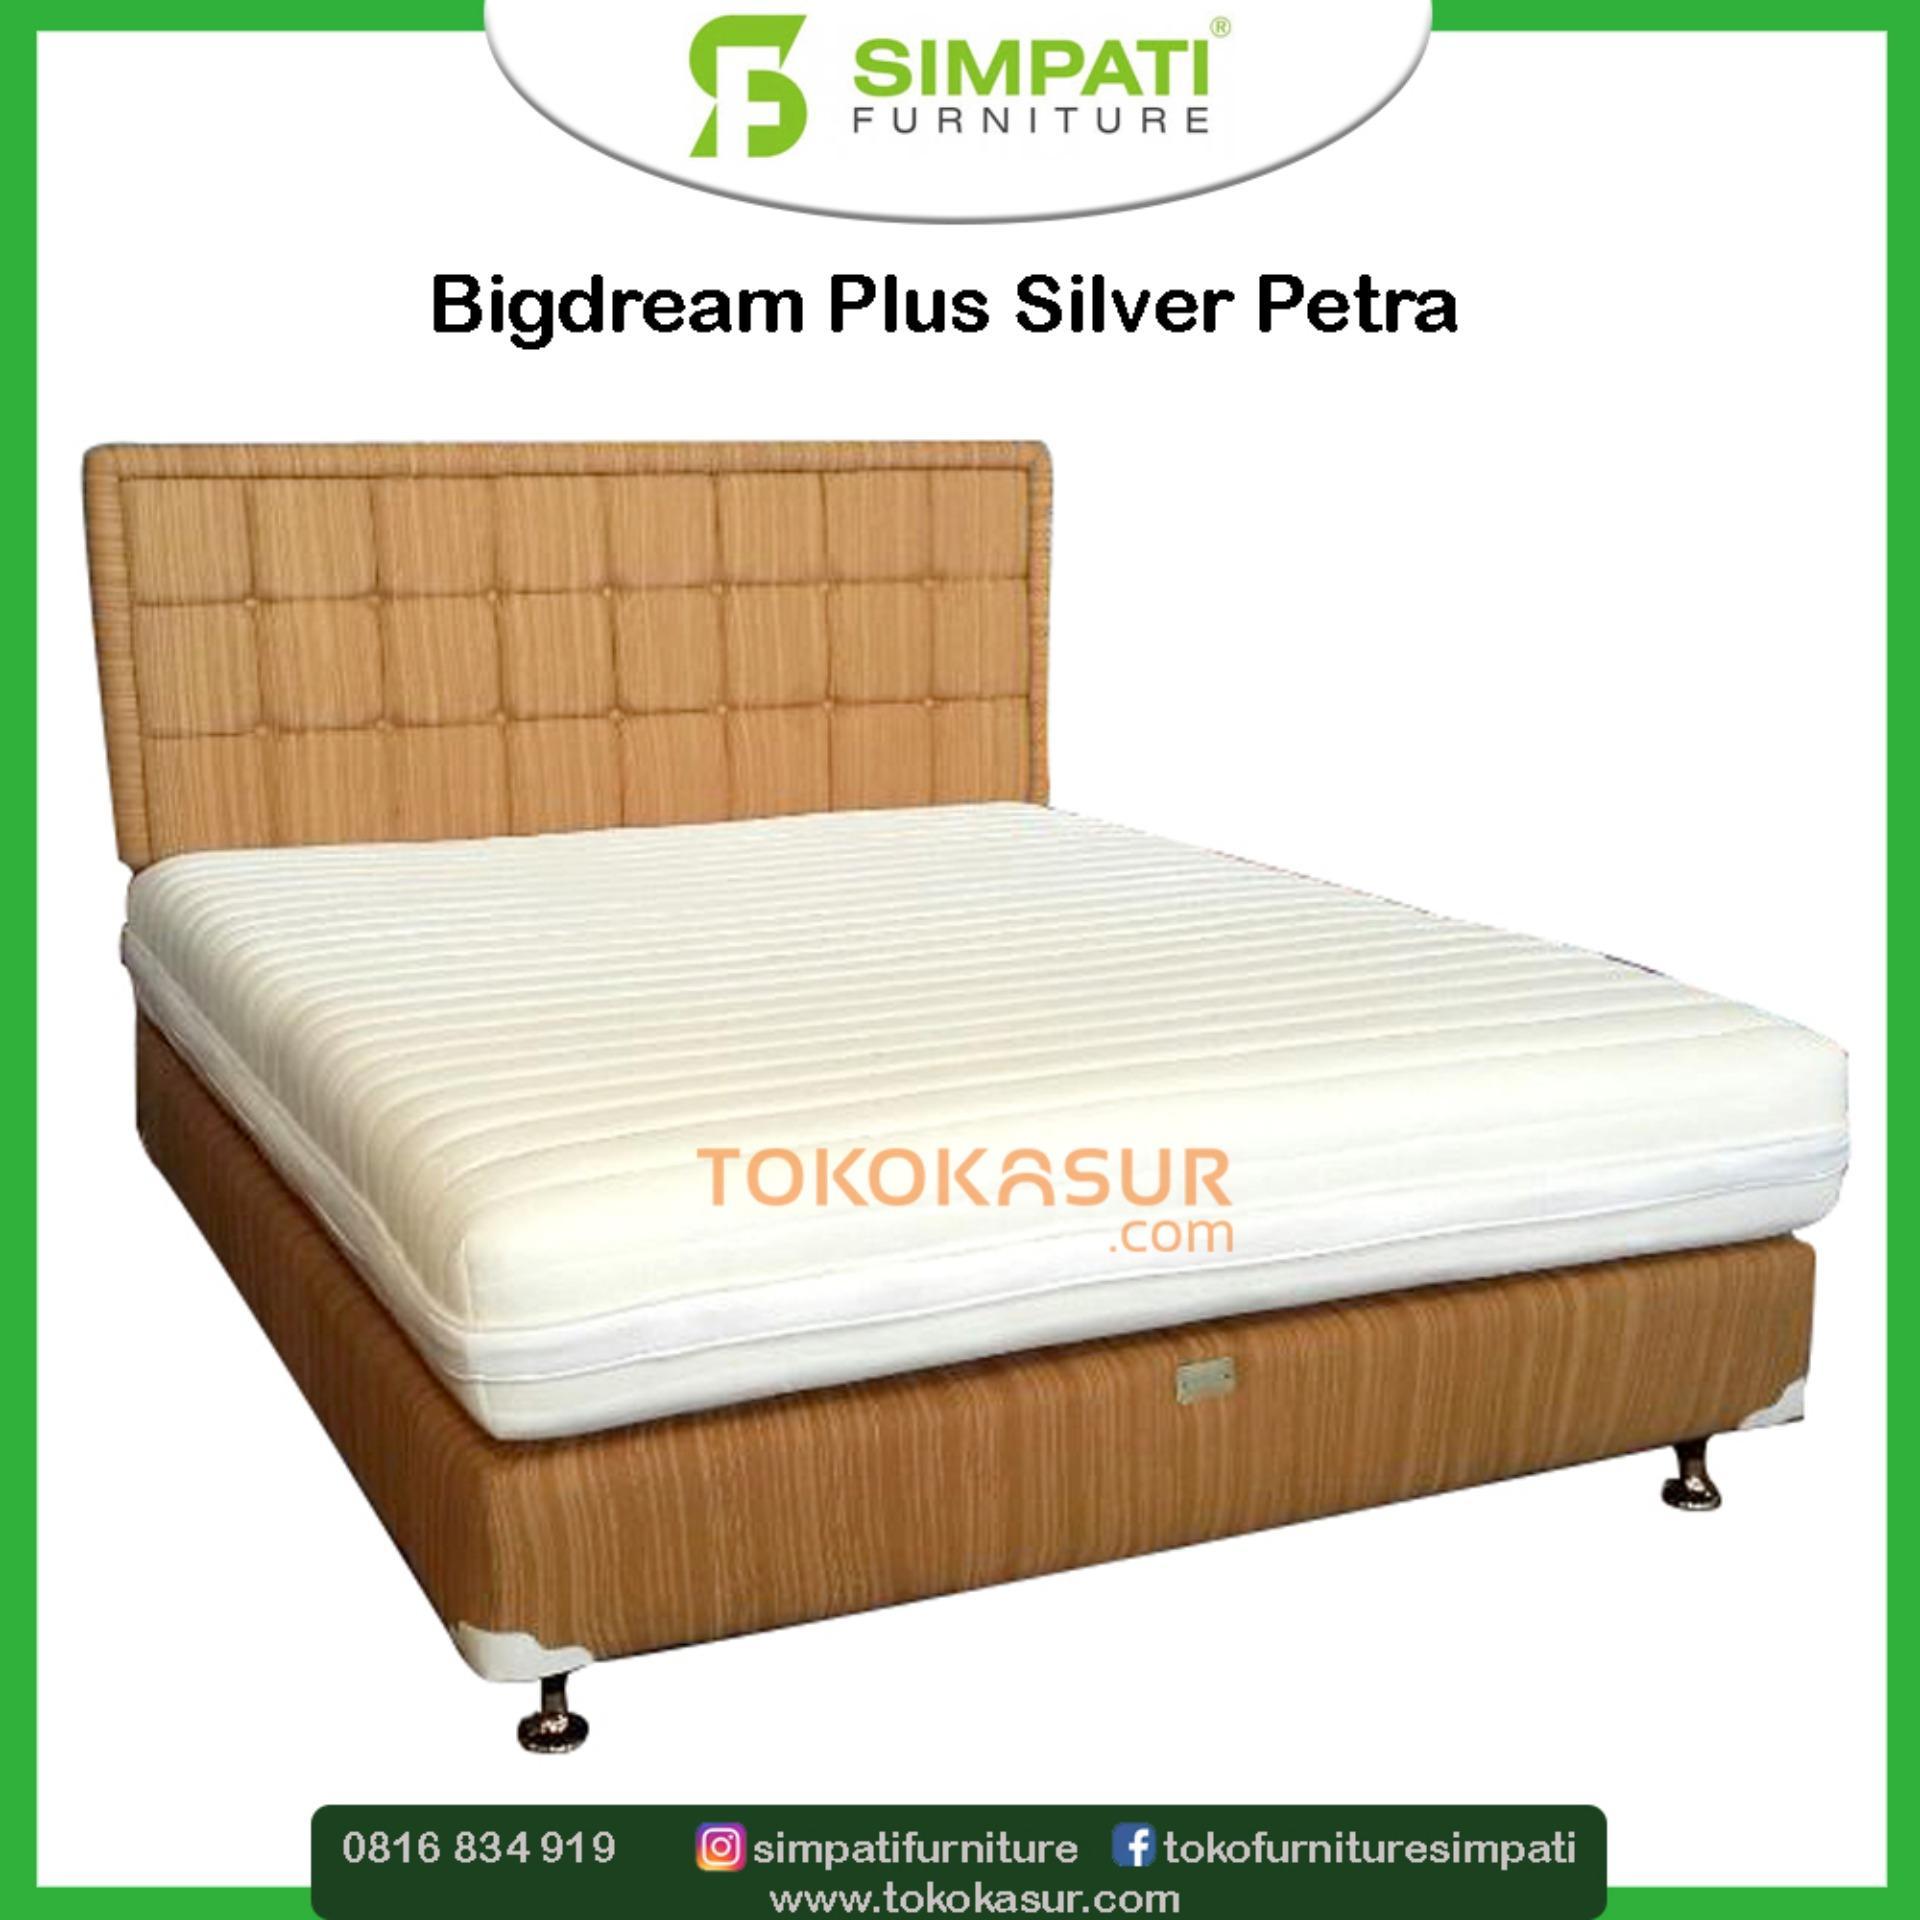 Bigdream Single Pillowtop 160x200 Kasur Tanpa Divan Sandaran Victory Sky Wash Dipan Headboard Untuk Dan Springbed Plus Silver Petra 100x200 Italiano